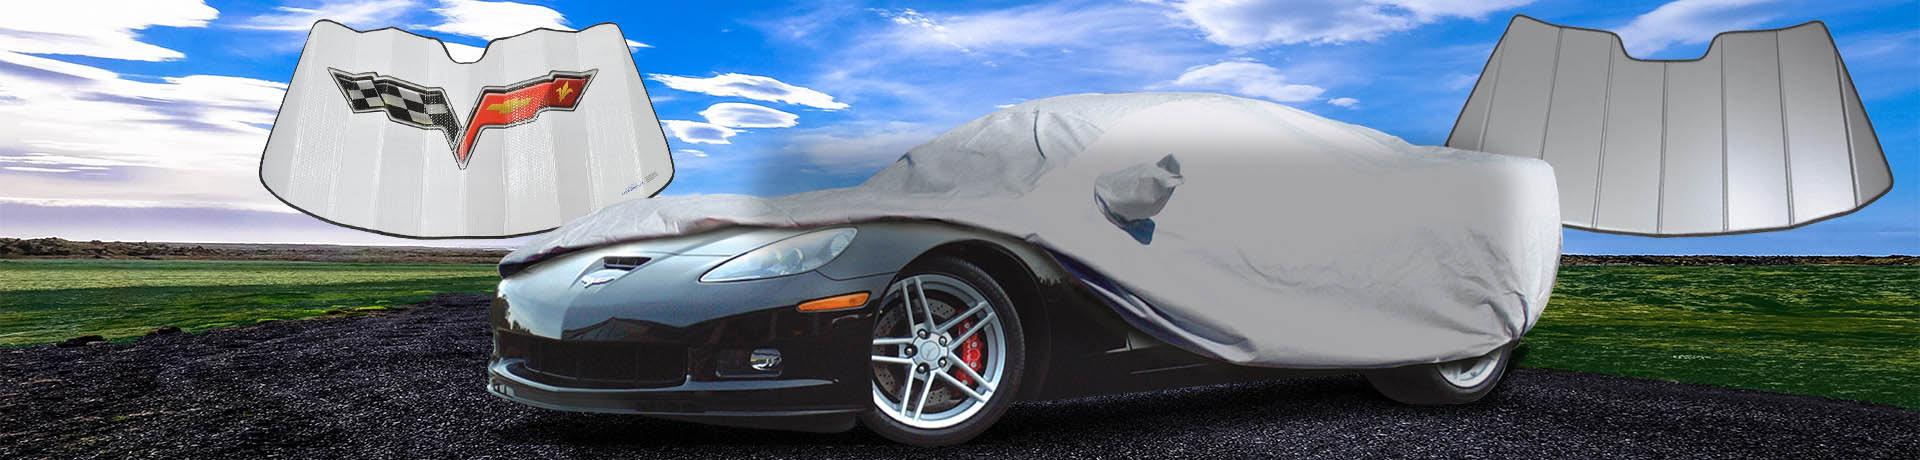 C5 Corvette Antenna Wiring Diagram C5 Get Free Image About Wiring